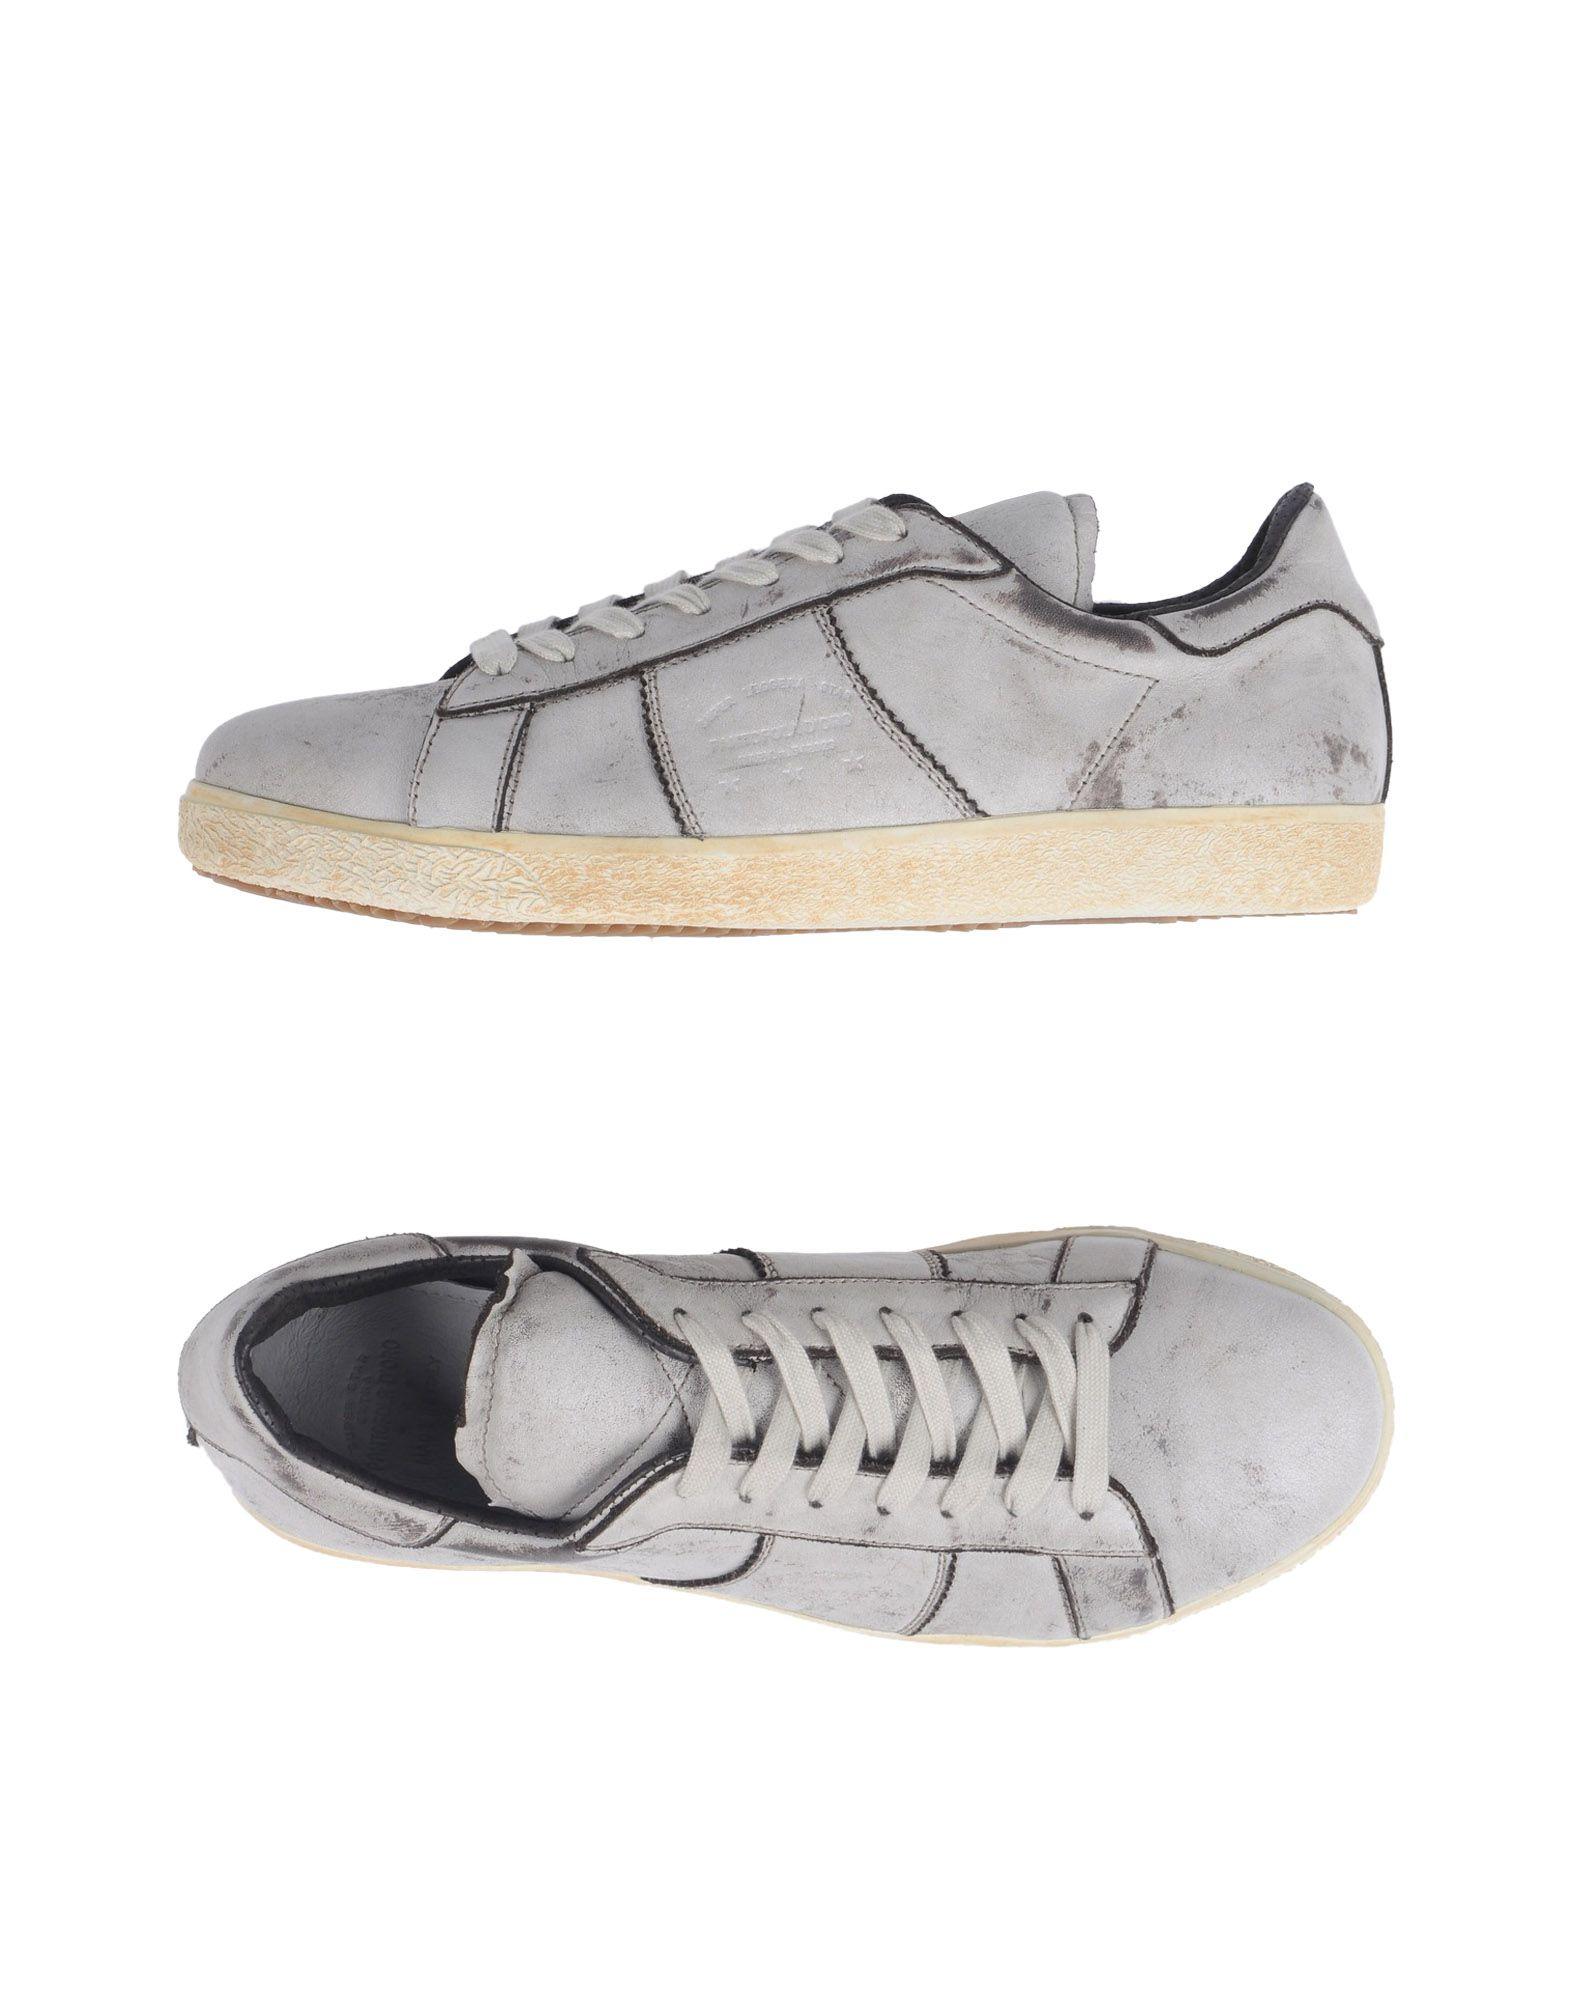 Pantofola Schuhe D'oro Sneakers Herren  11353973VV Neue Schuhe Pantofola 06b403